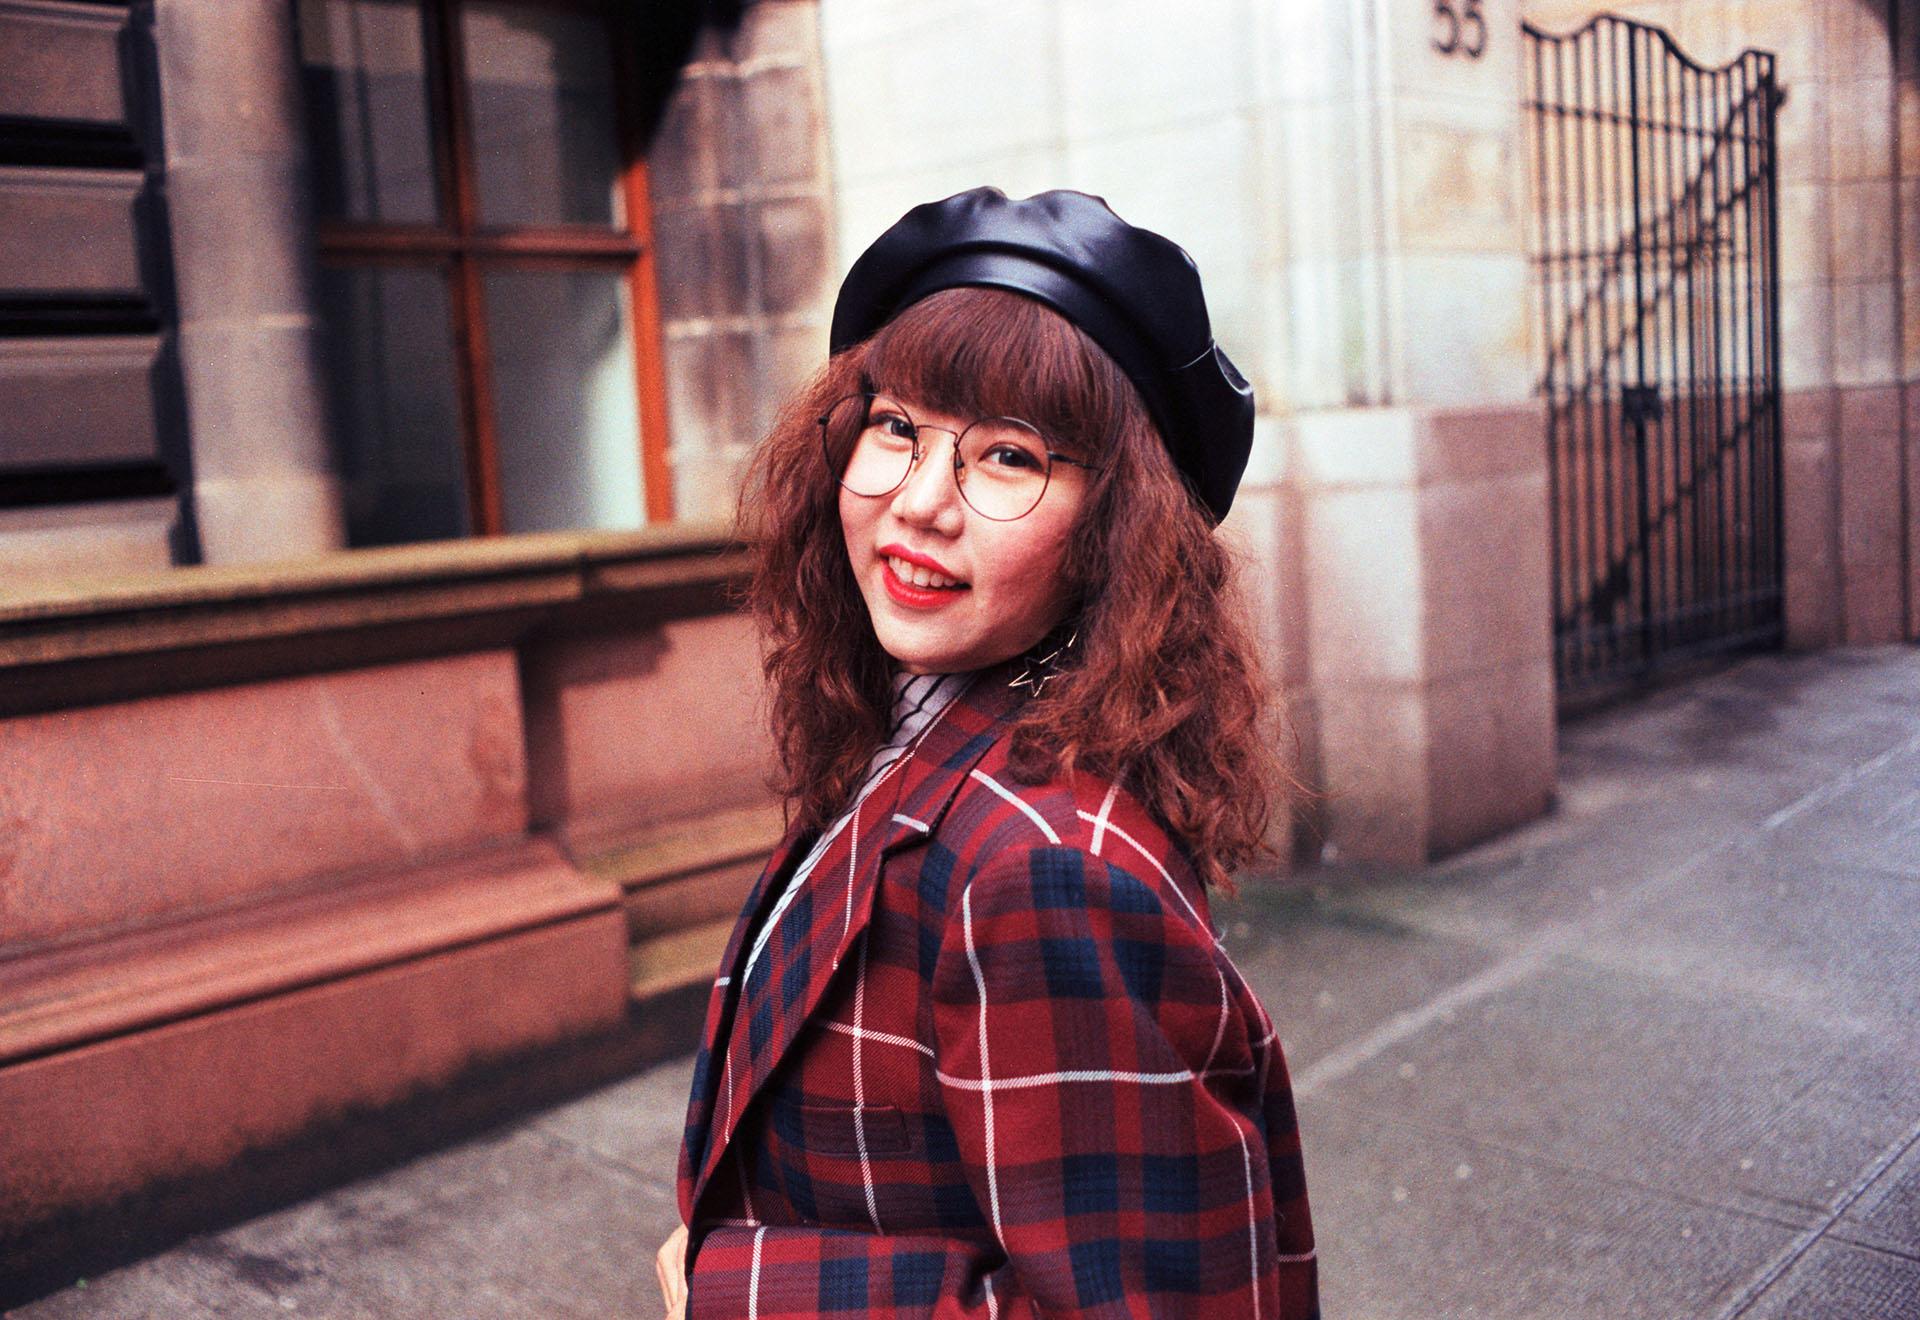 35mm film portrait